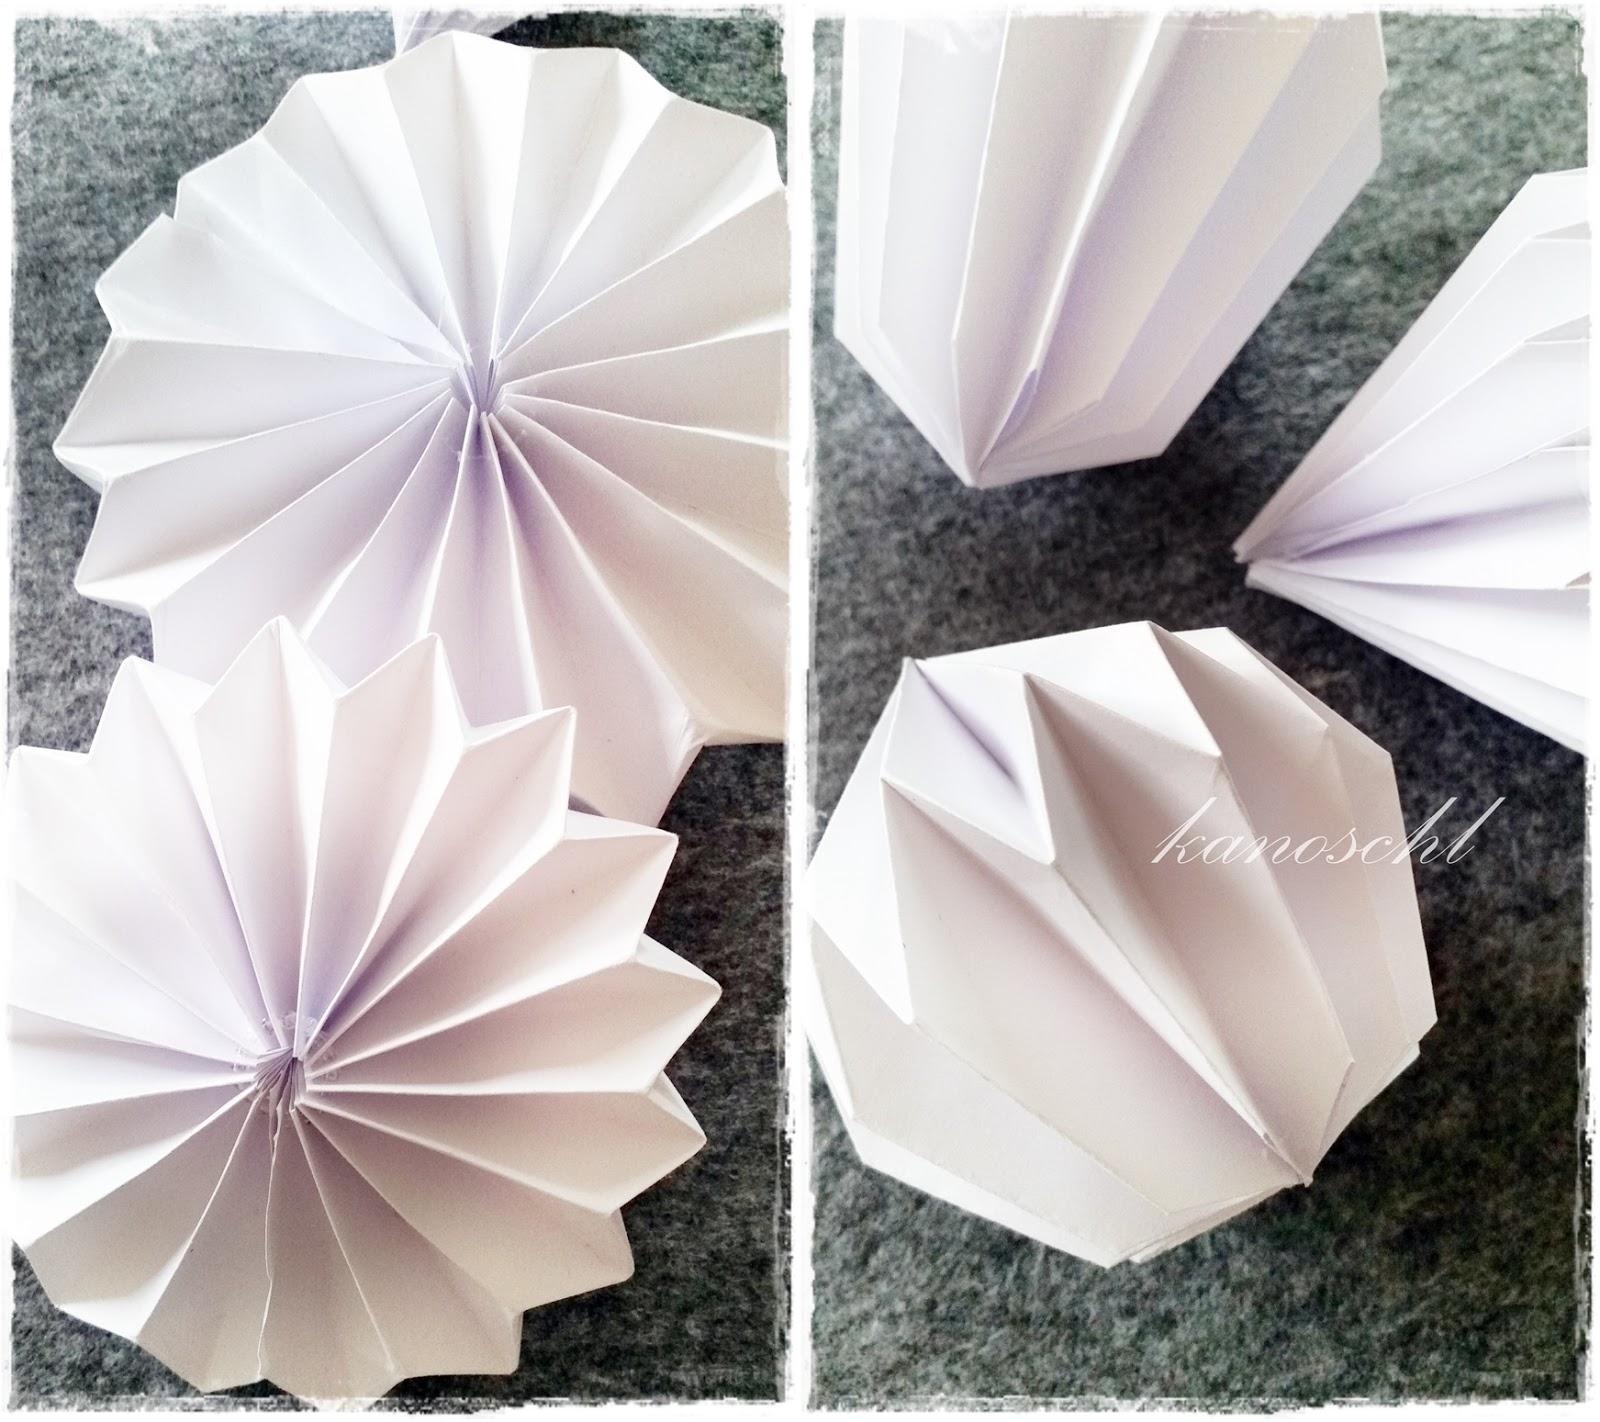 kanoschl ecken kanten aus papier plissee falten give. Black Bedroom Furniture Sets. Home Design Ideas